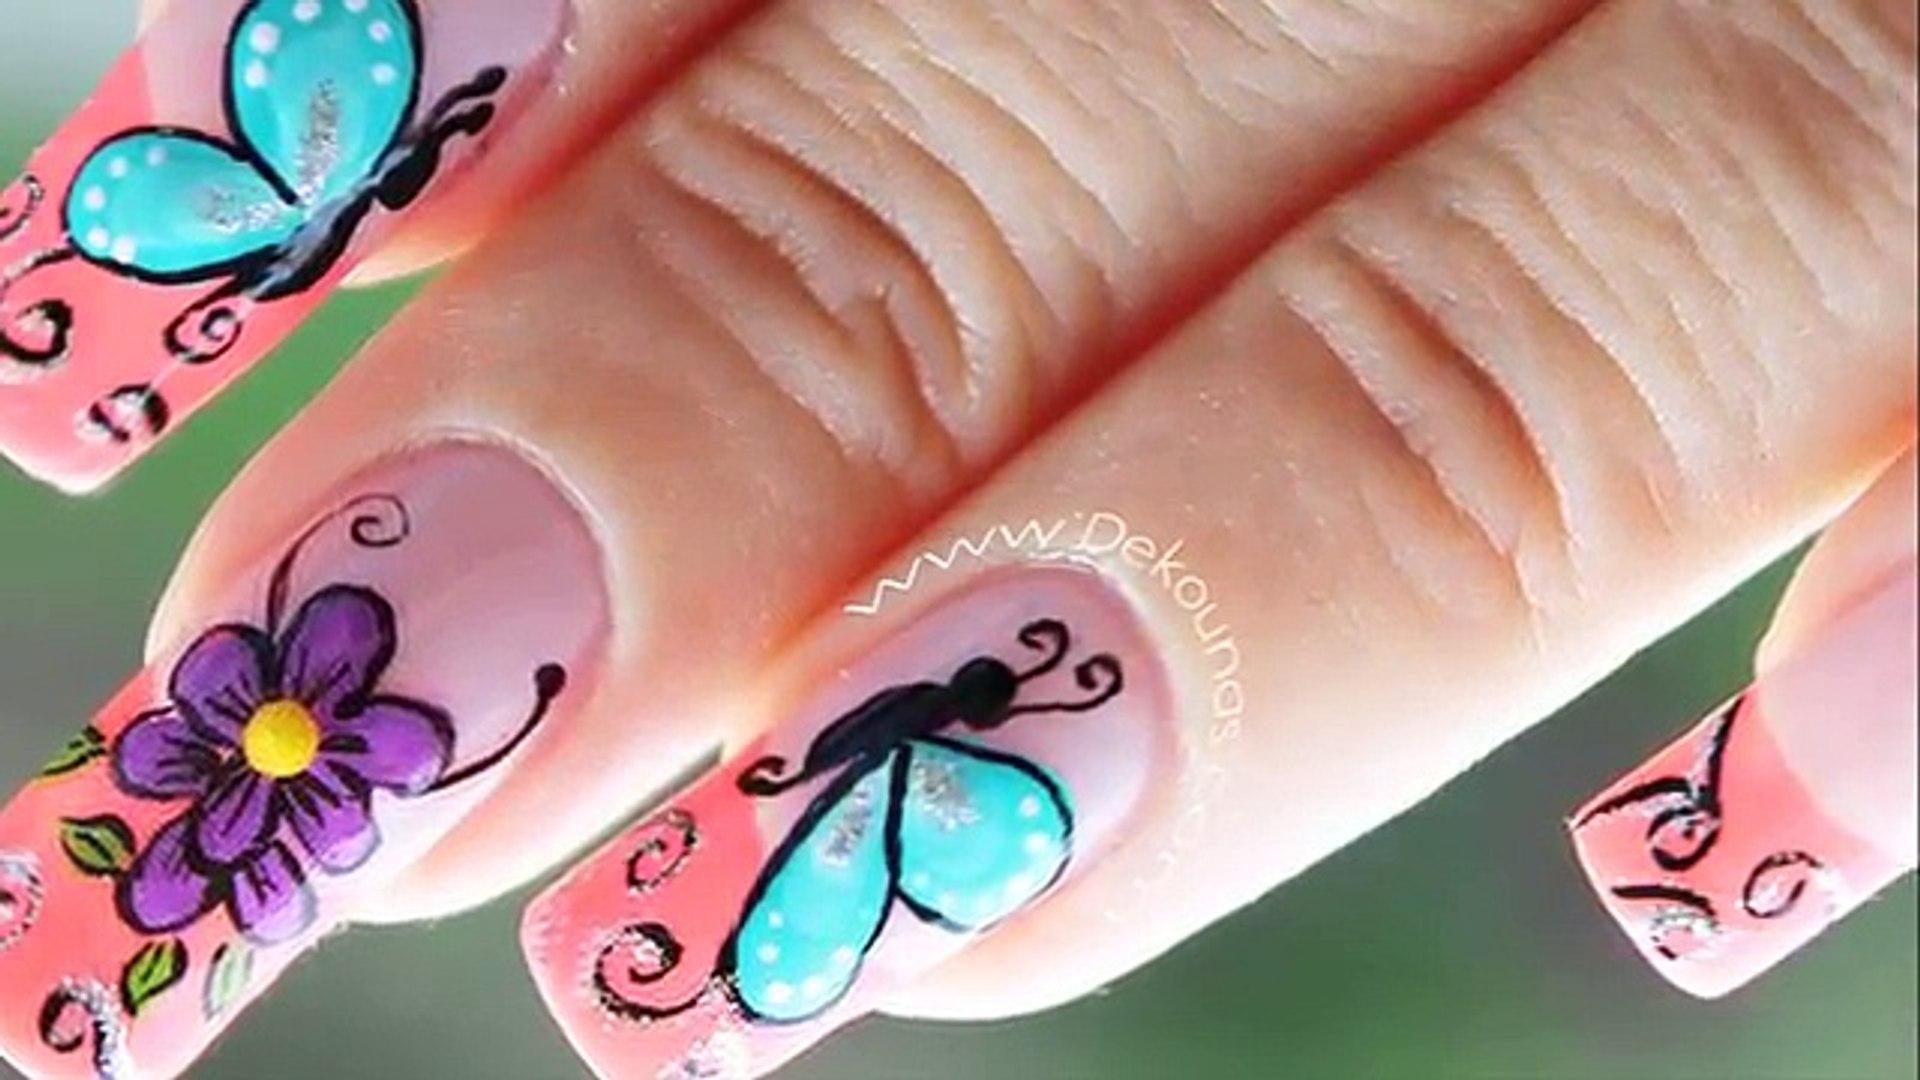 Decoracion De Uñas Mariposas Y Flores Facil Butterfly And Flower Nail Art